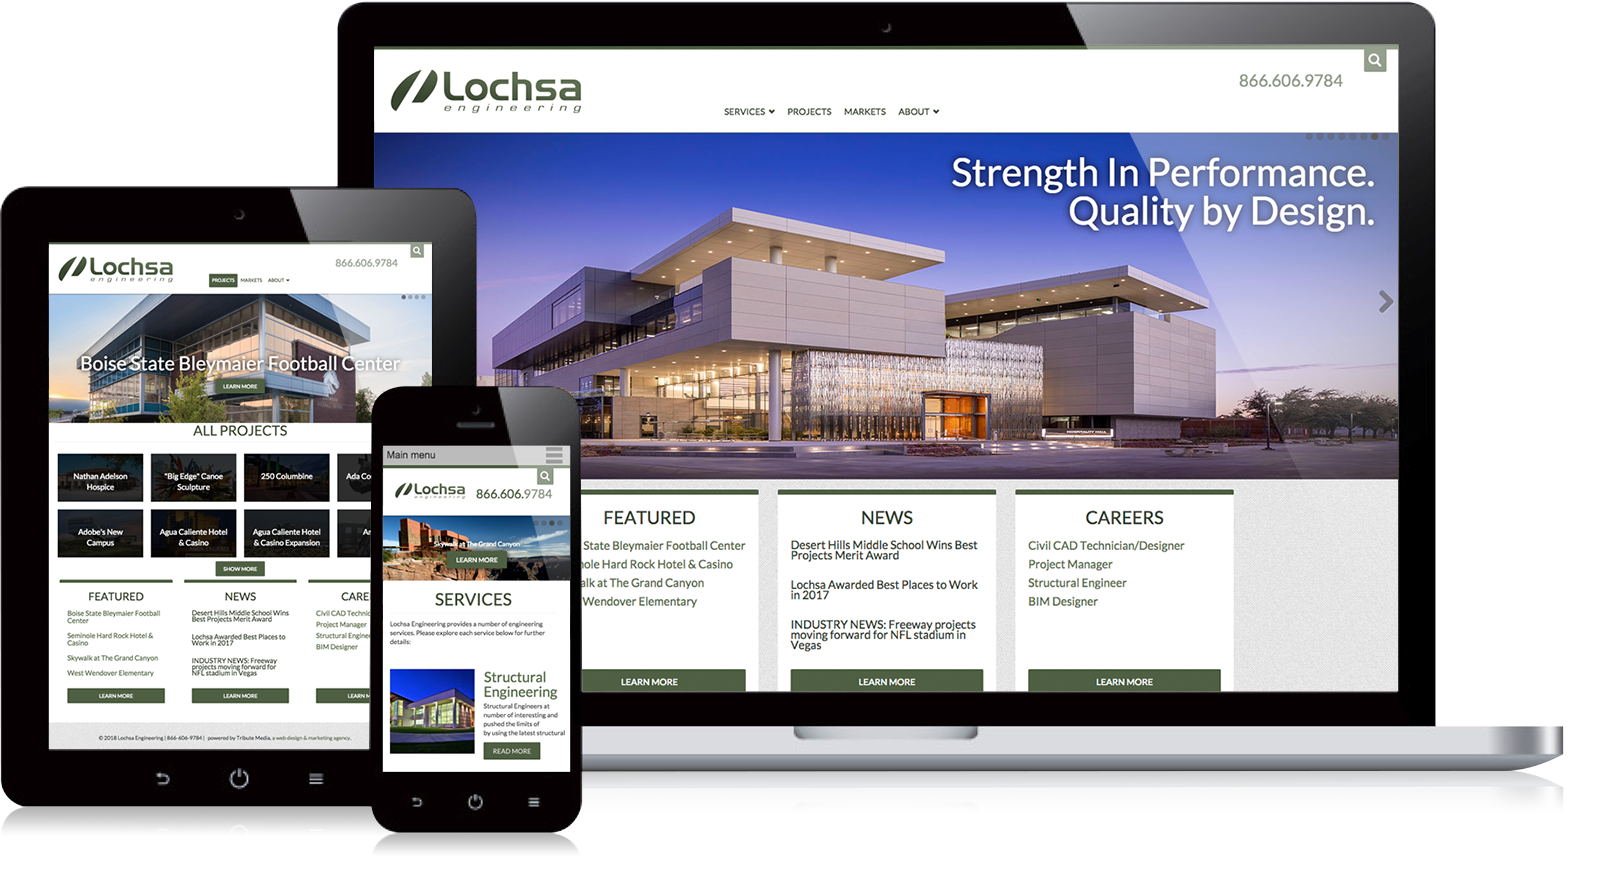 Lochsa Engineering website